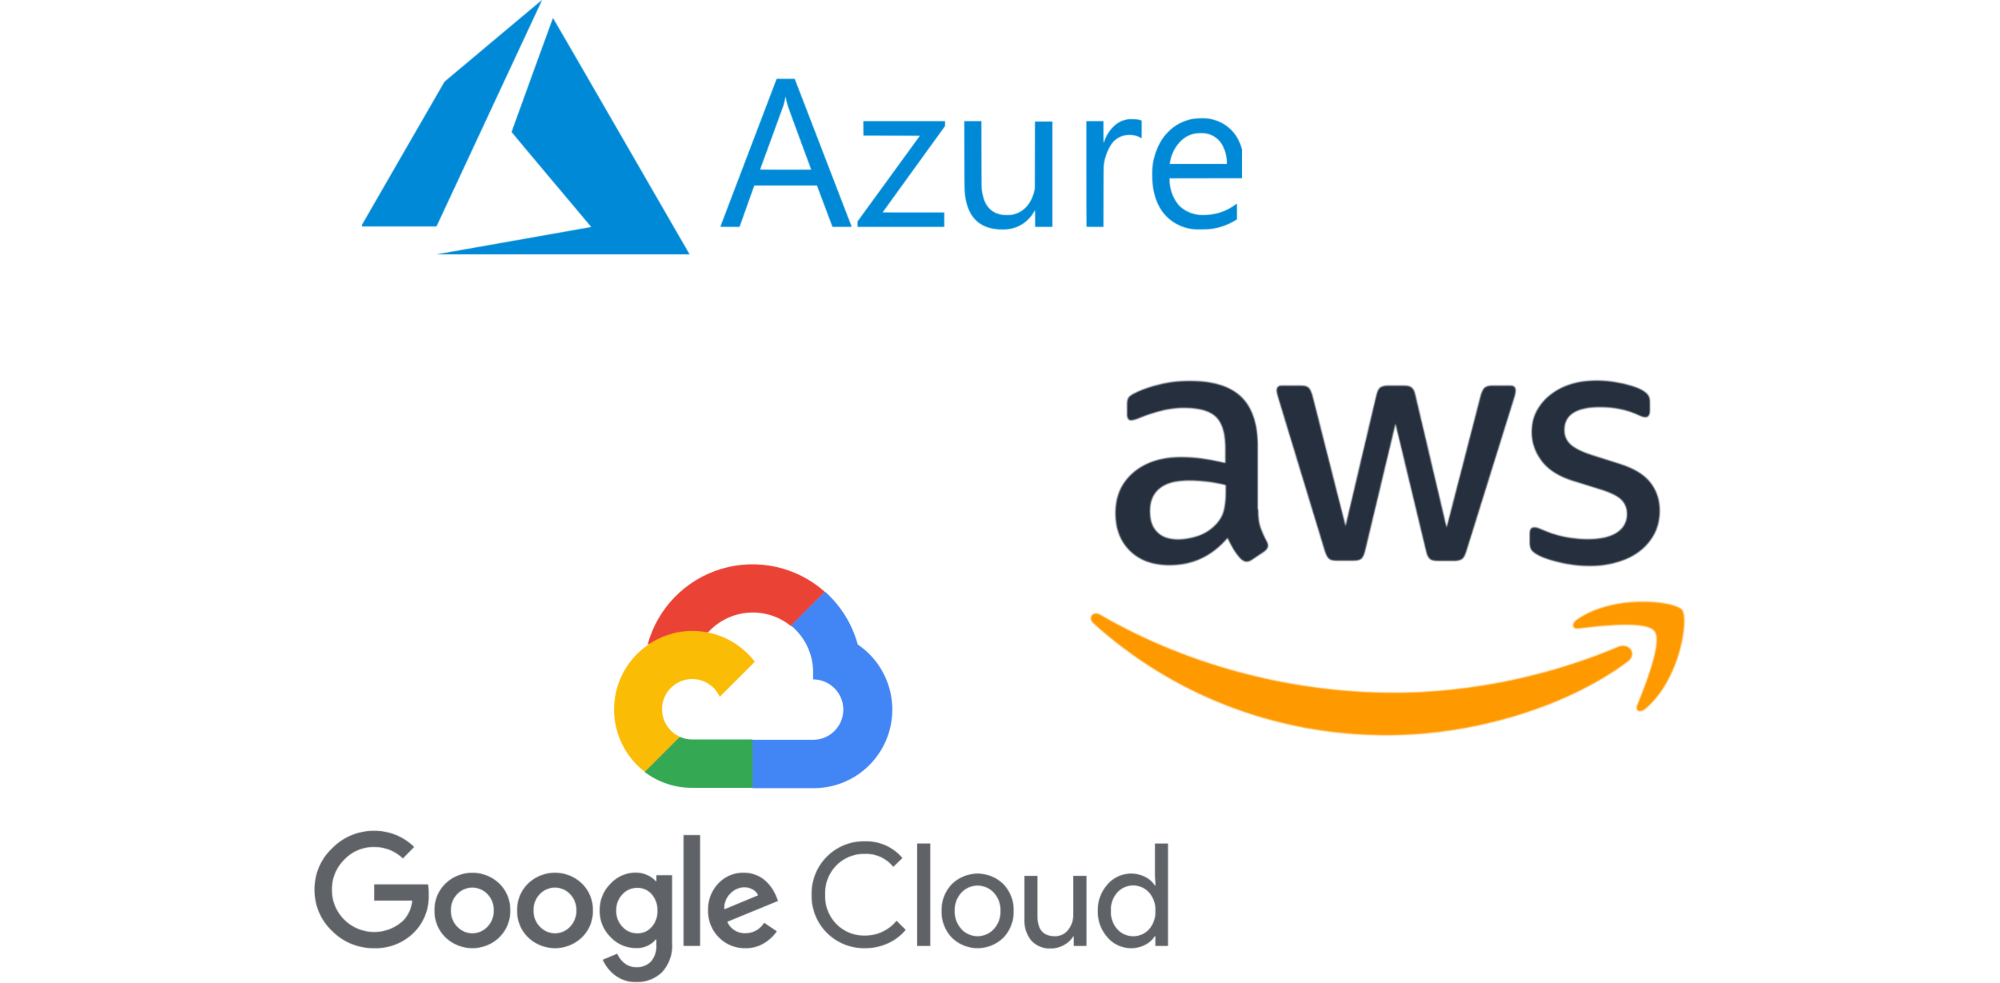 azure aws and google cloud storage logos